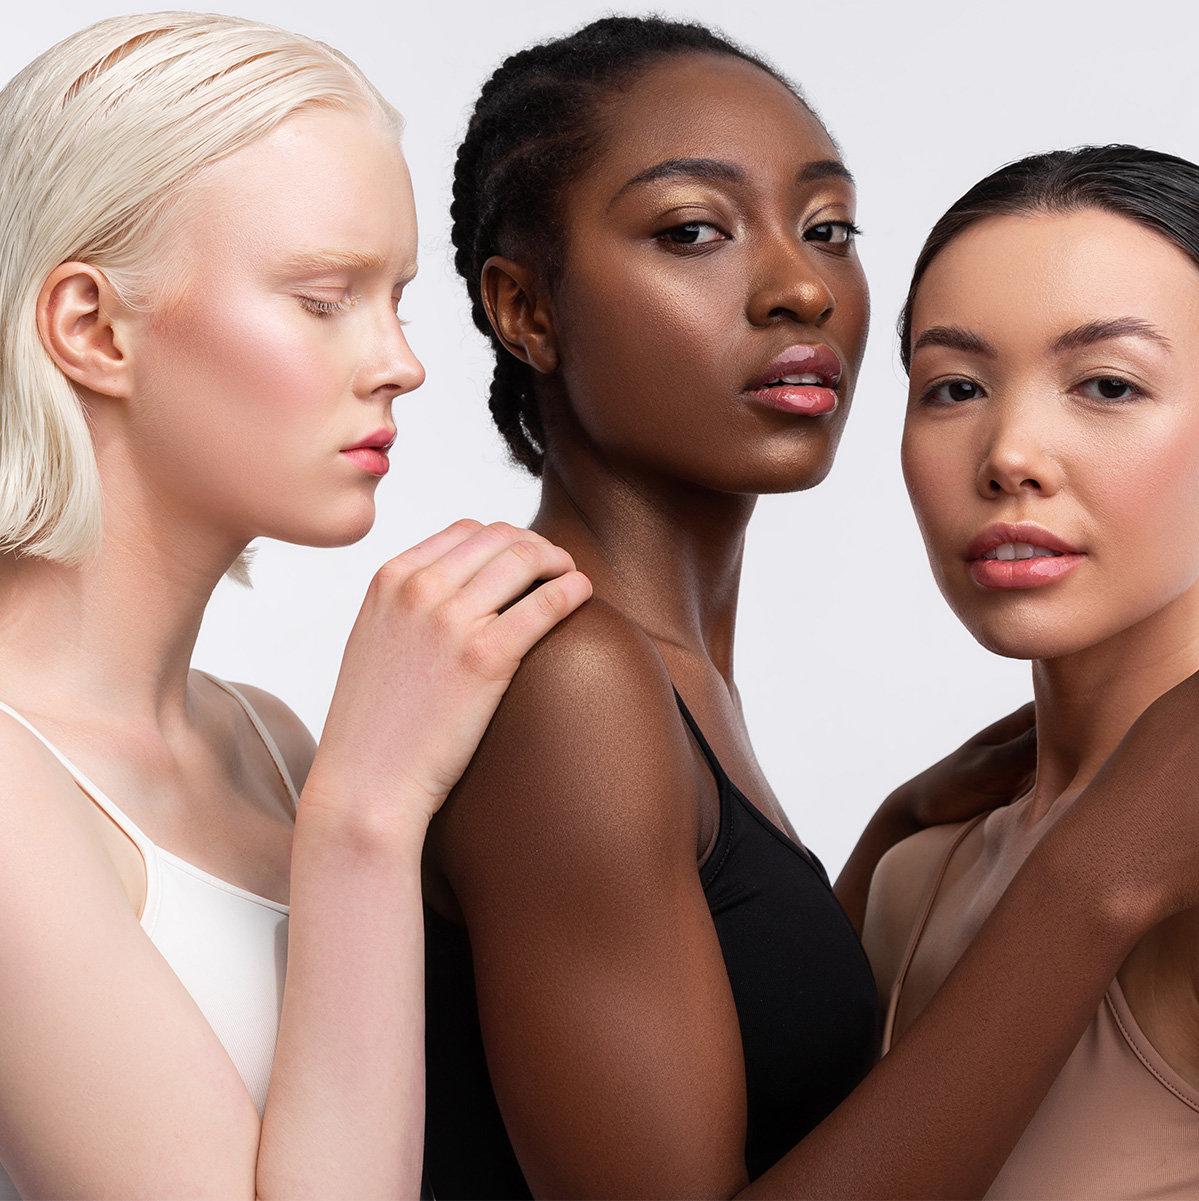 Group Makeup Tutorial - Intermediate